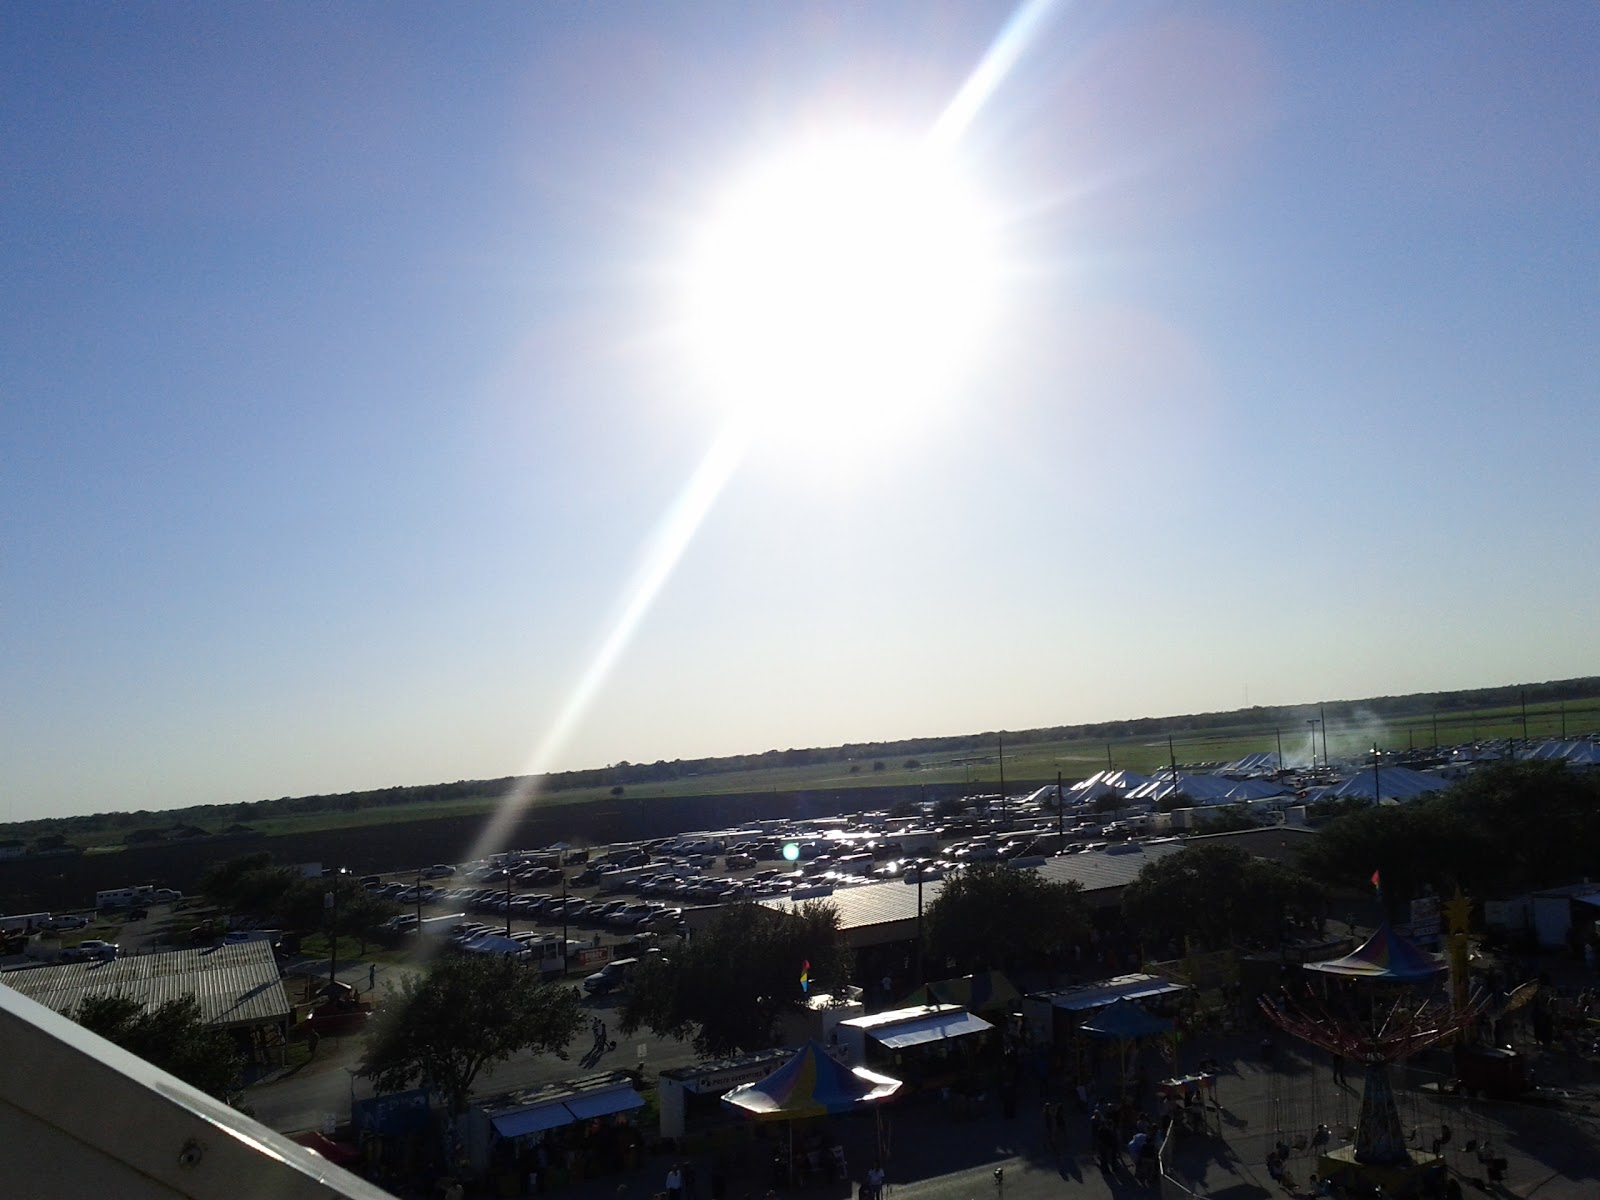 Fort Bend County Fair 2011 - IMG_20111001_174728.jpg